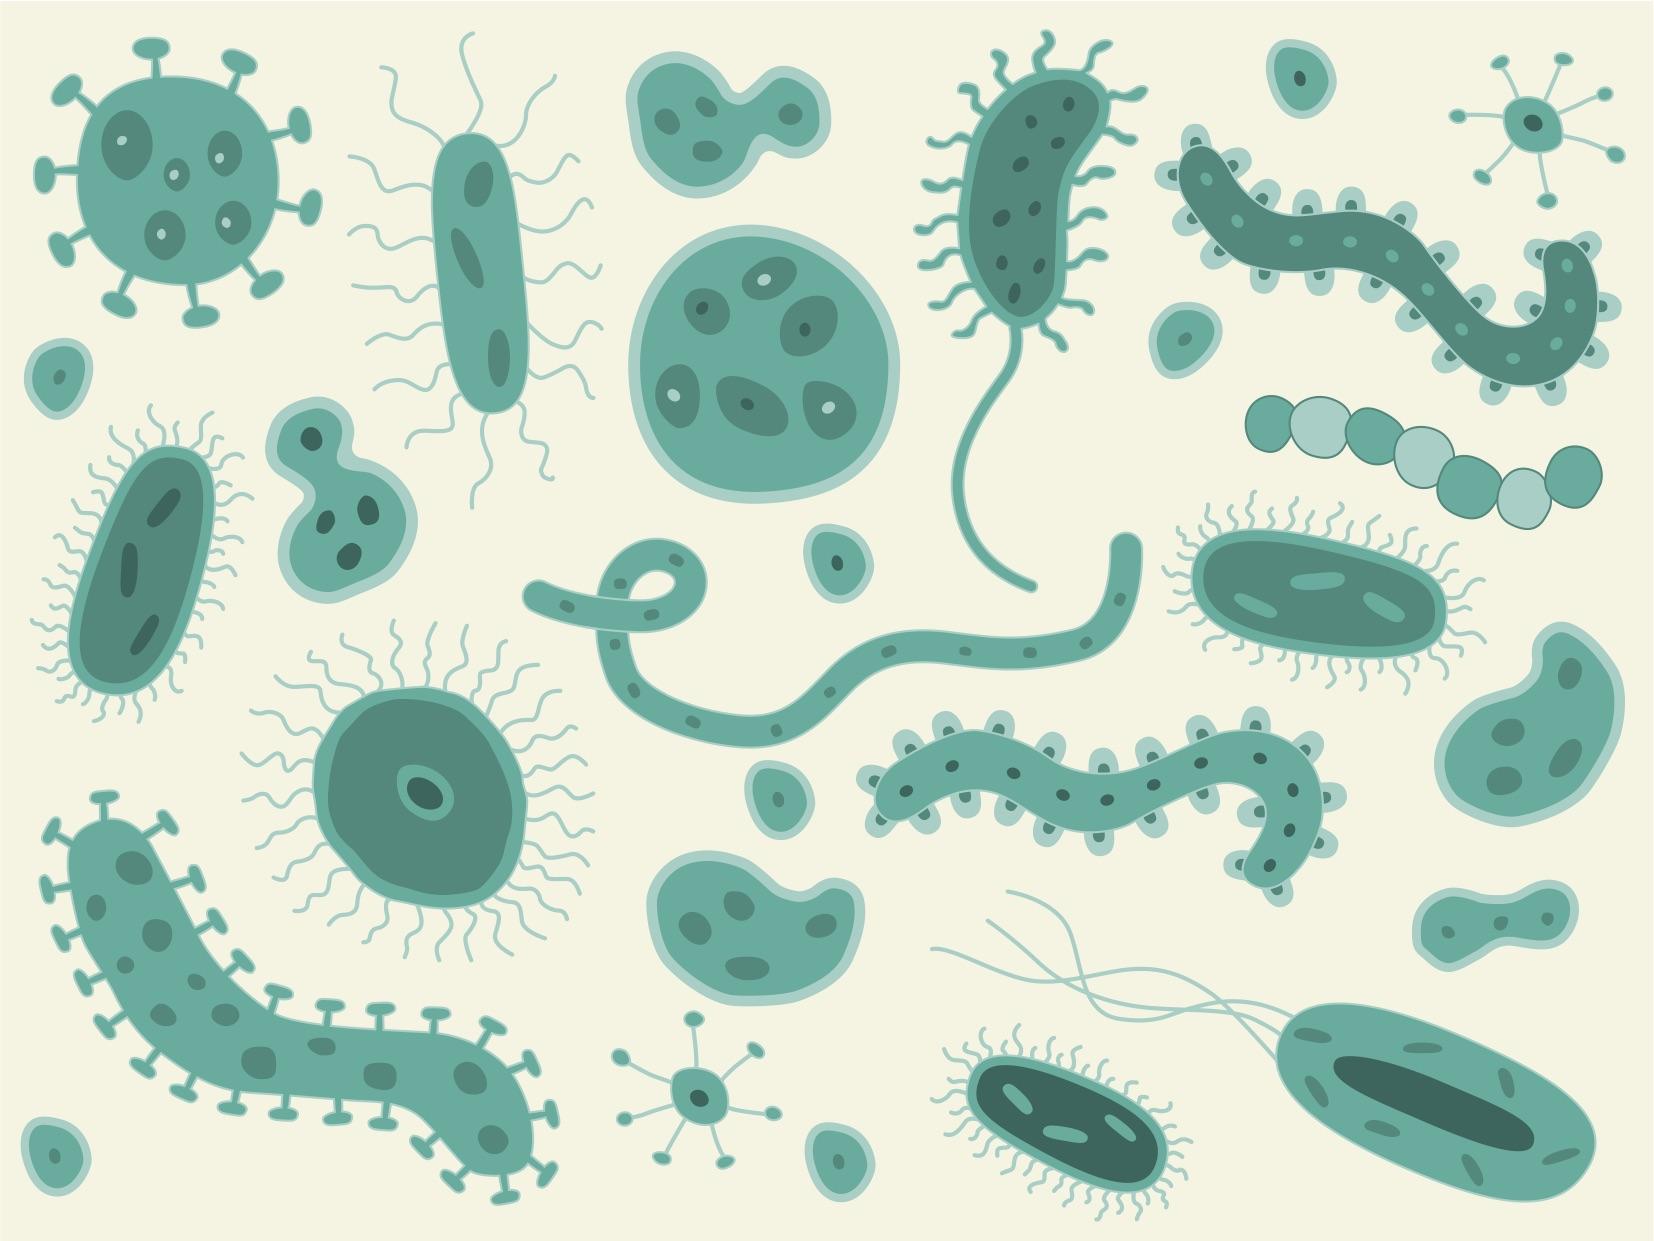 Infectious Disease Fridays #IDFridays